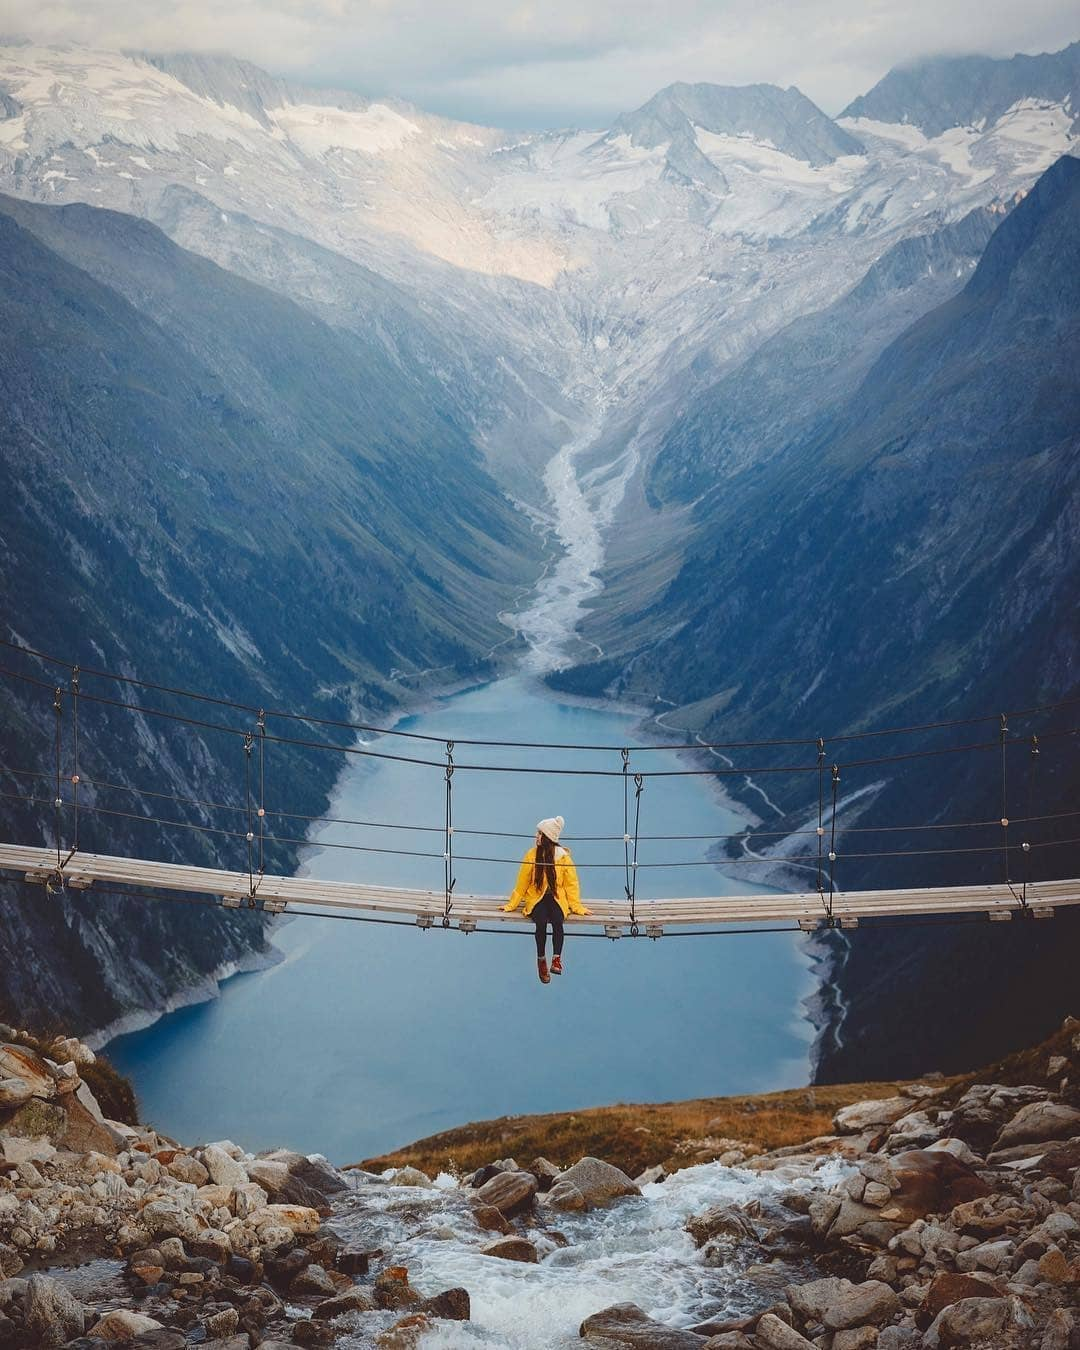 Thung lũng Zillertal, Hồ Schlegeis, Tyrol, Áo